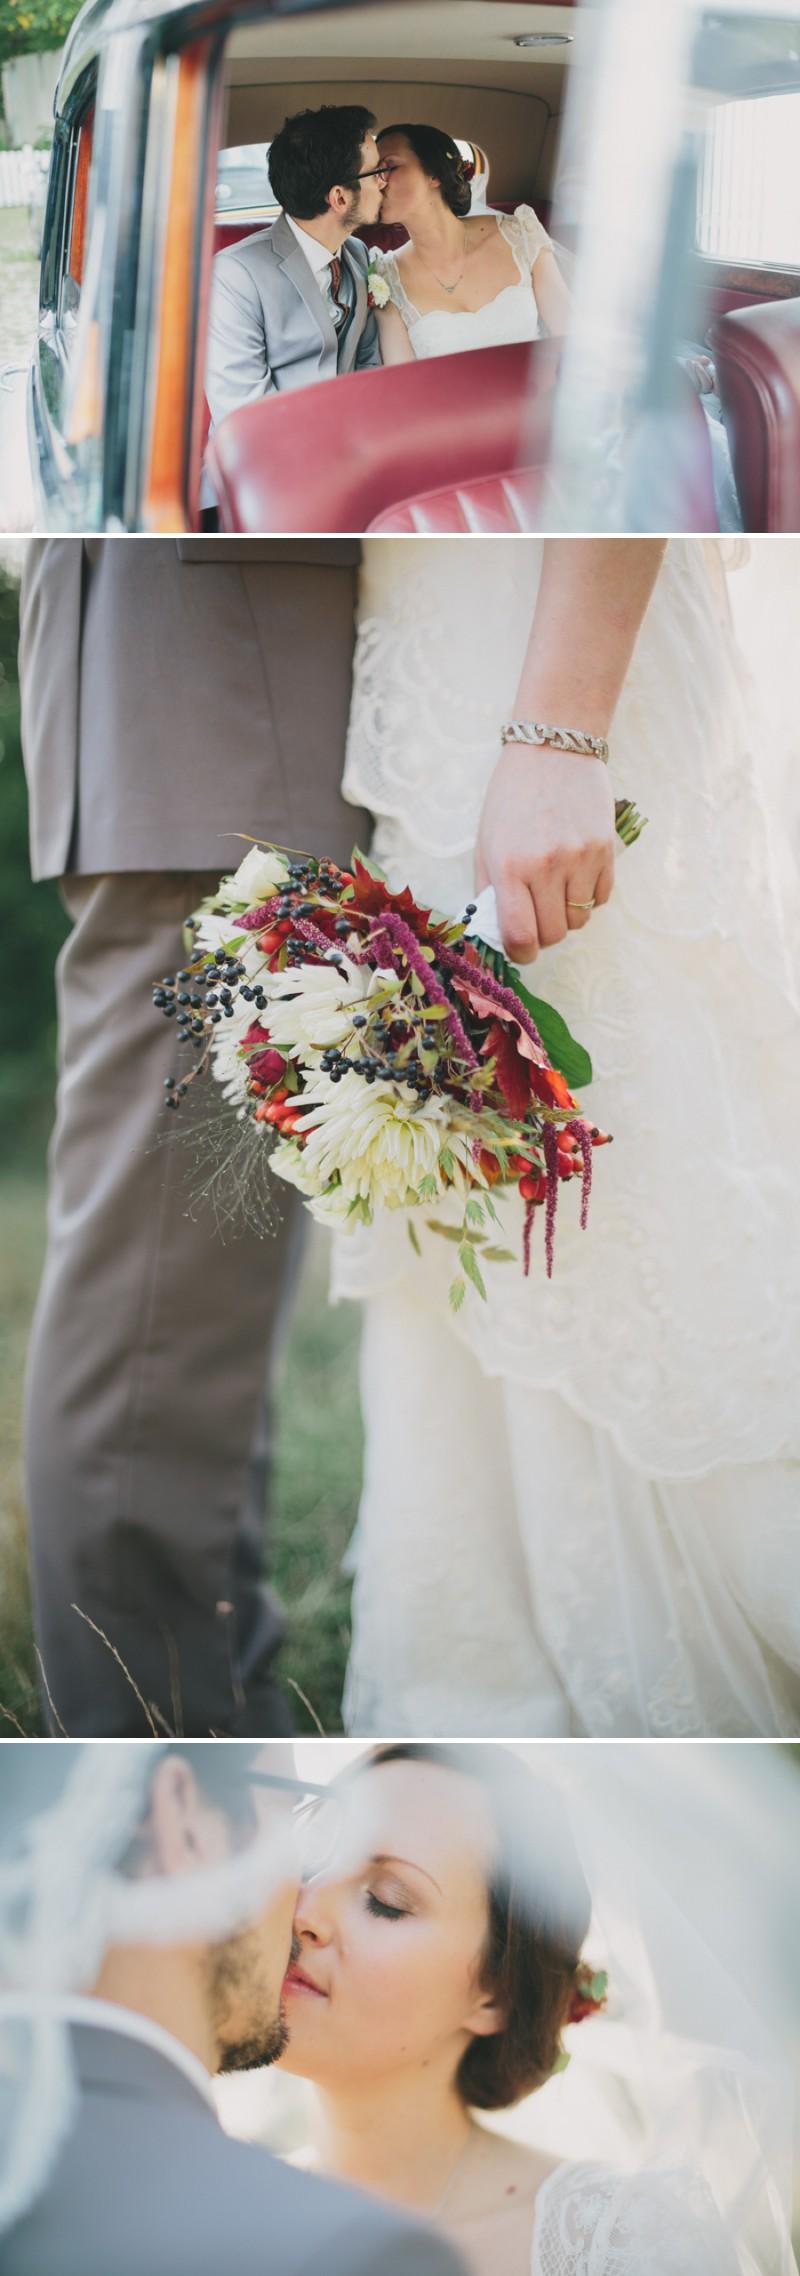 Downton Abbey Wedding Dress 39 New  An Eco Friendly